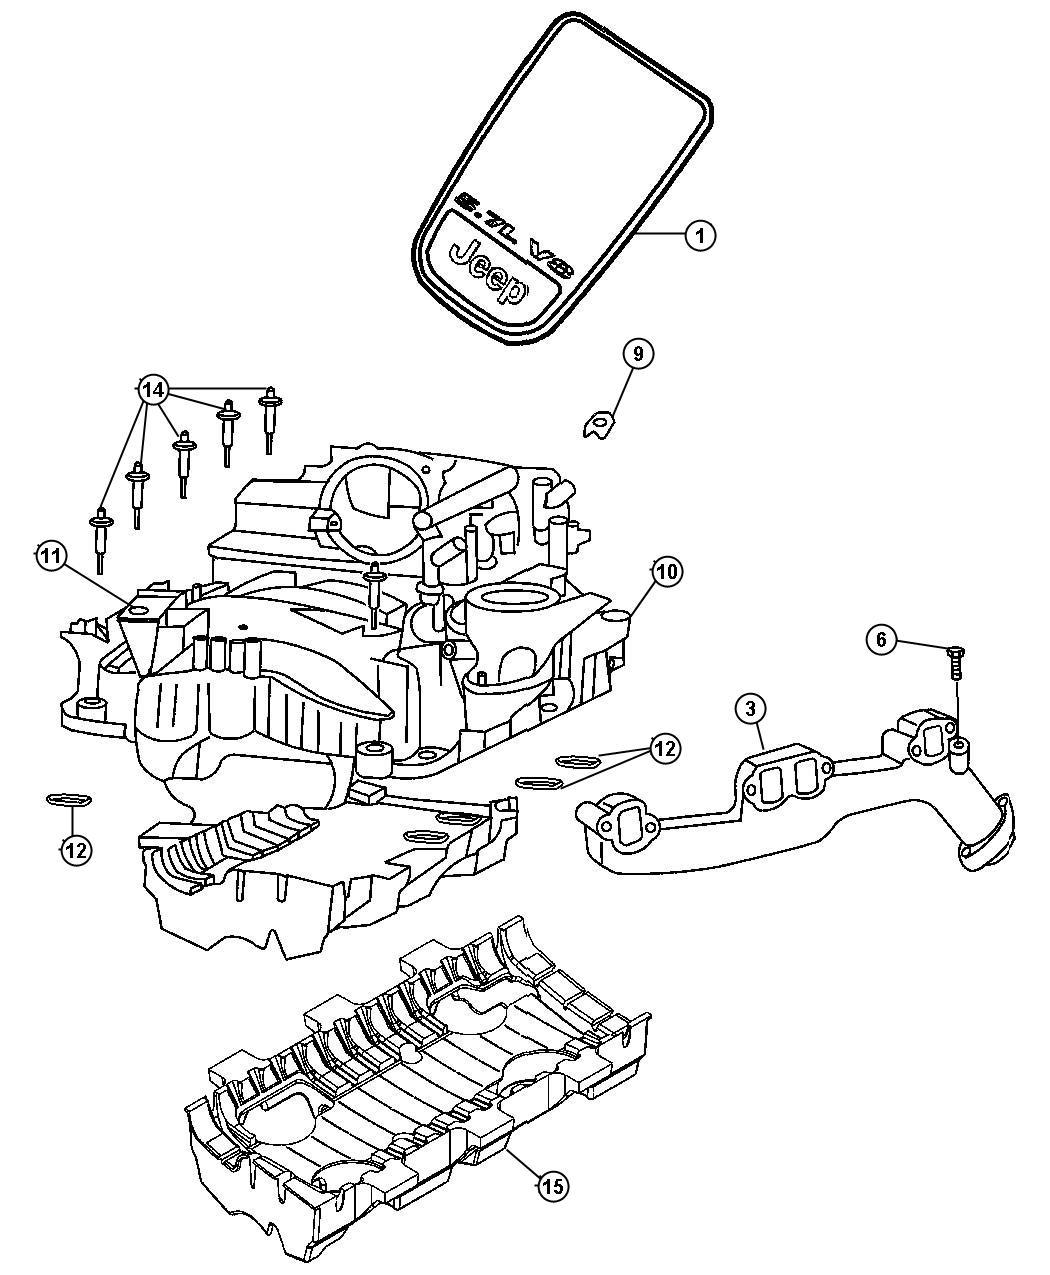 Jeep Grand Cherokee Manifold  Exhaust  Right  Ezb